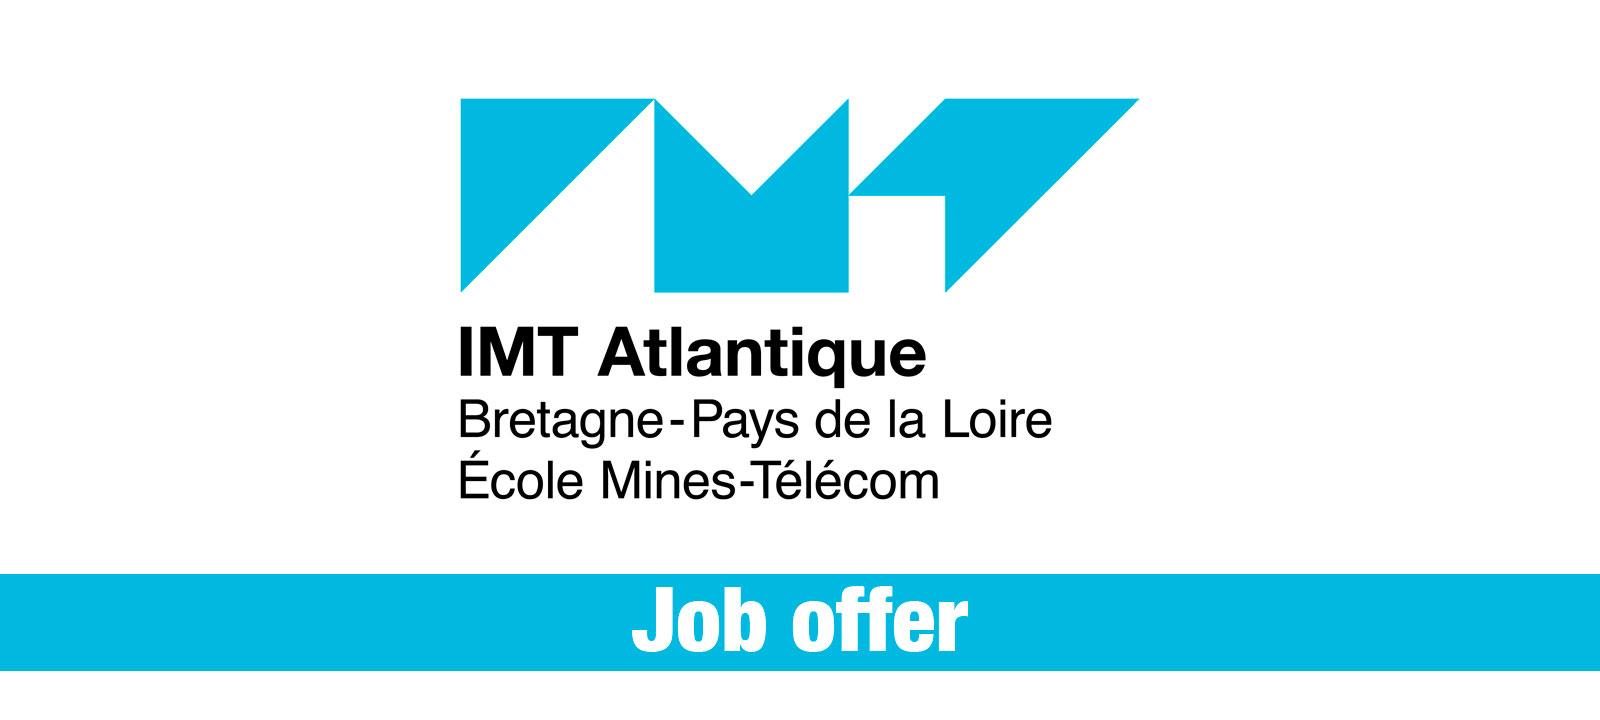 Job Offer Imt Atlantique | Uniandes